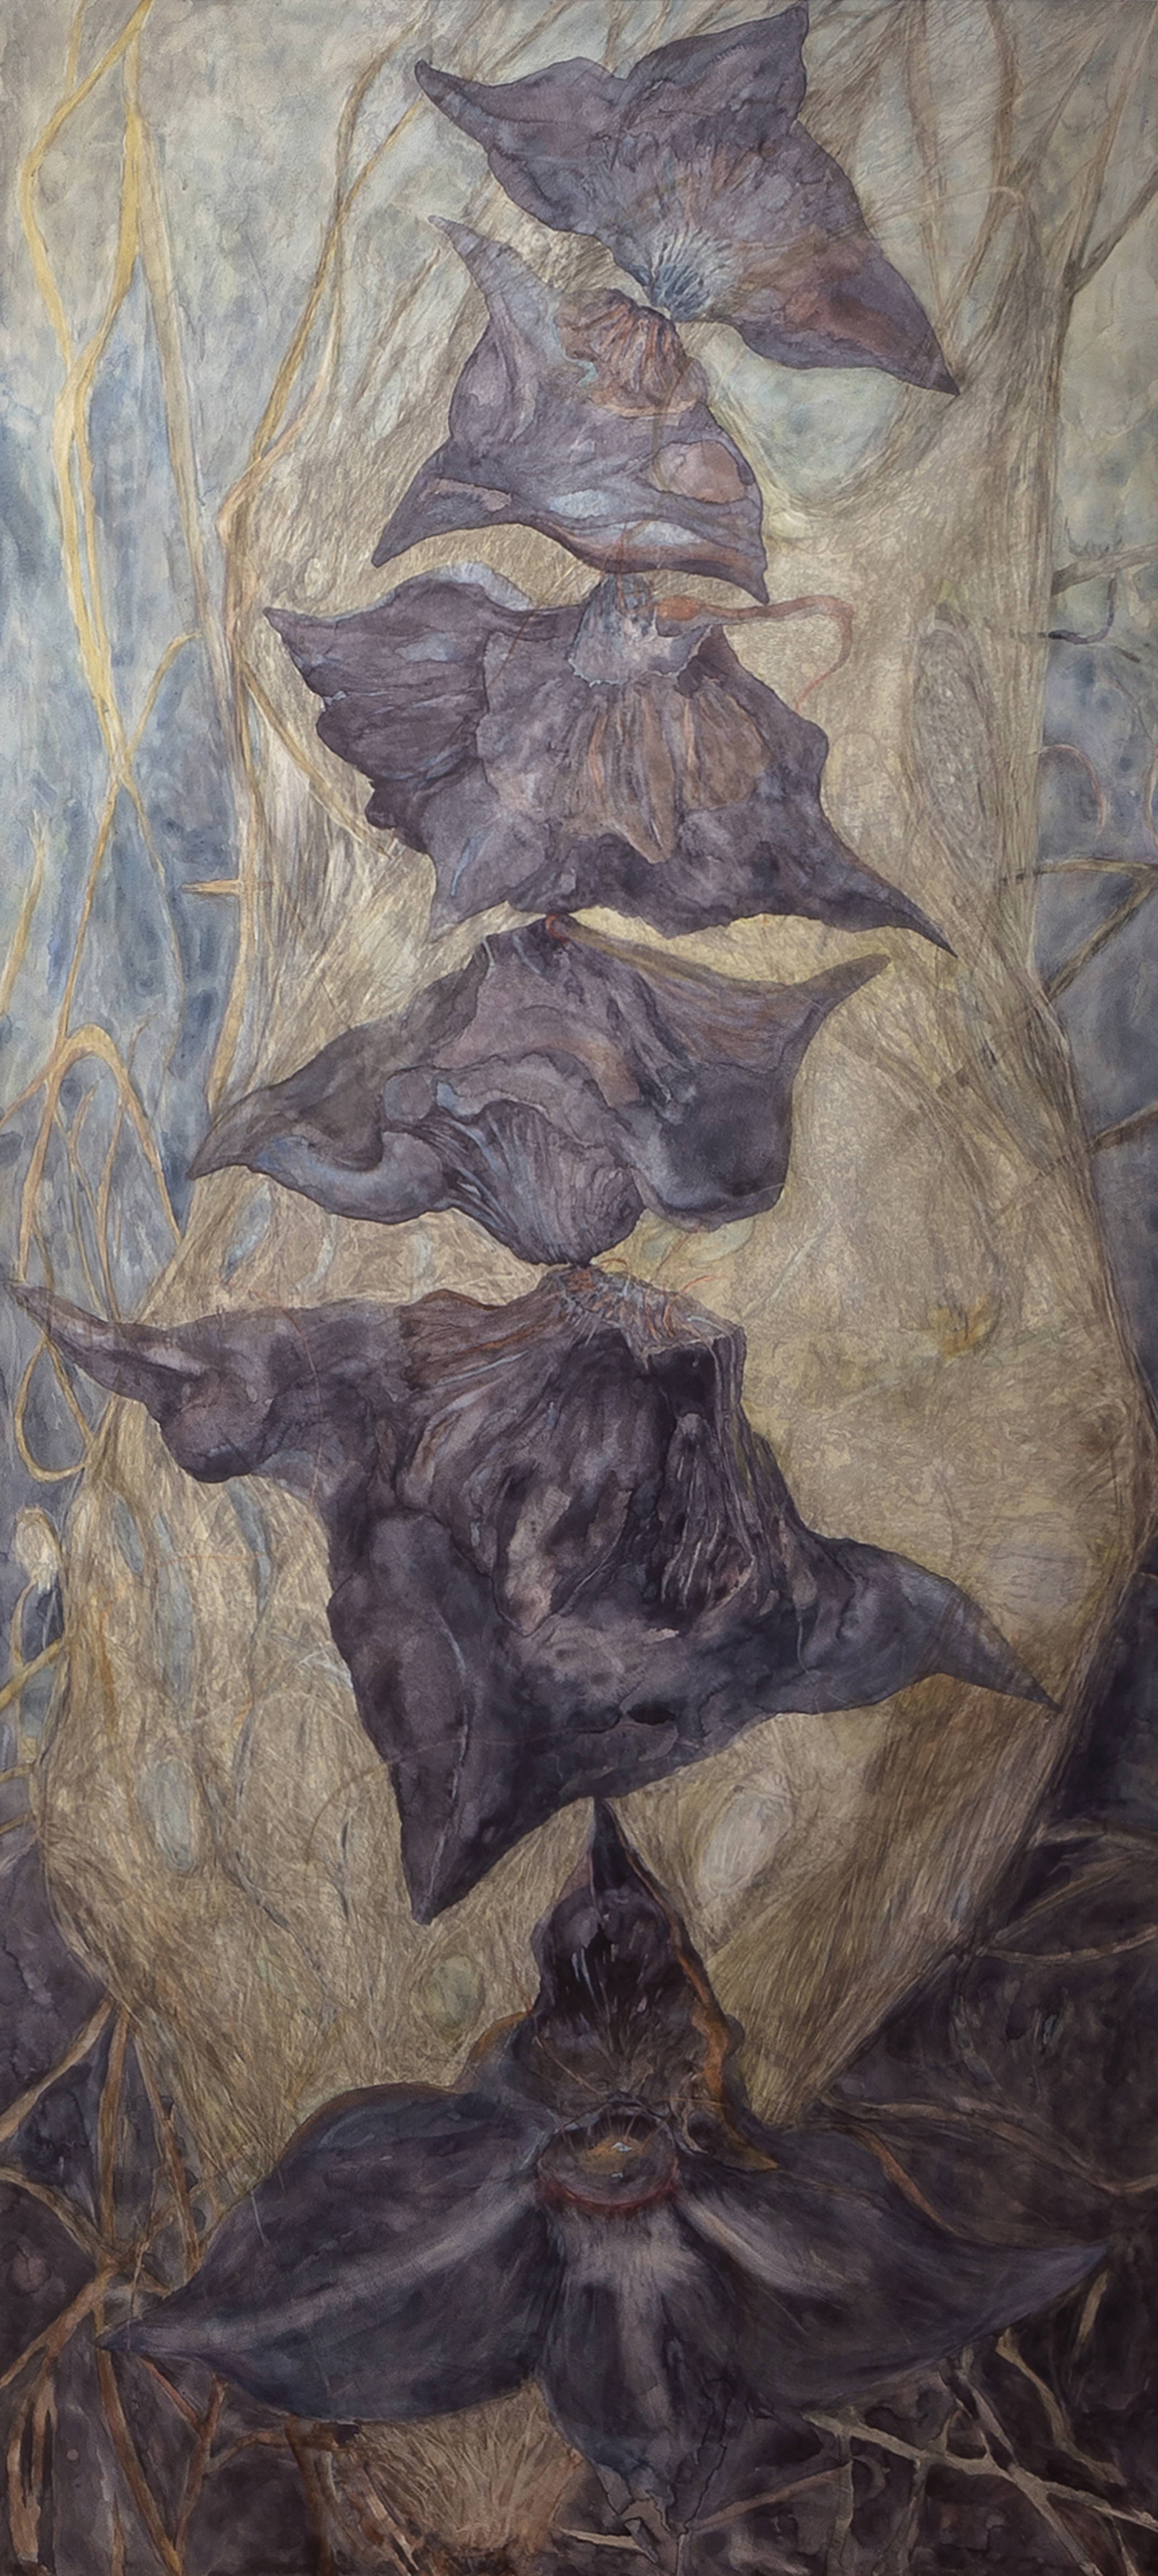 "Unbalanced Nature, Pod, 2014, Watercolor, archival pigment print on clayboard, 66"" x 30"""